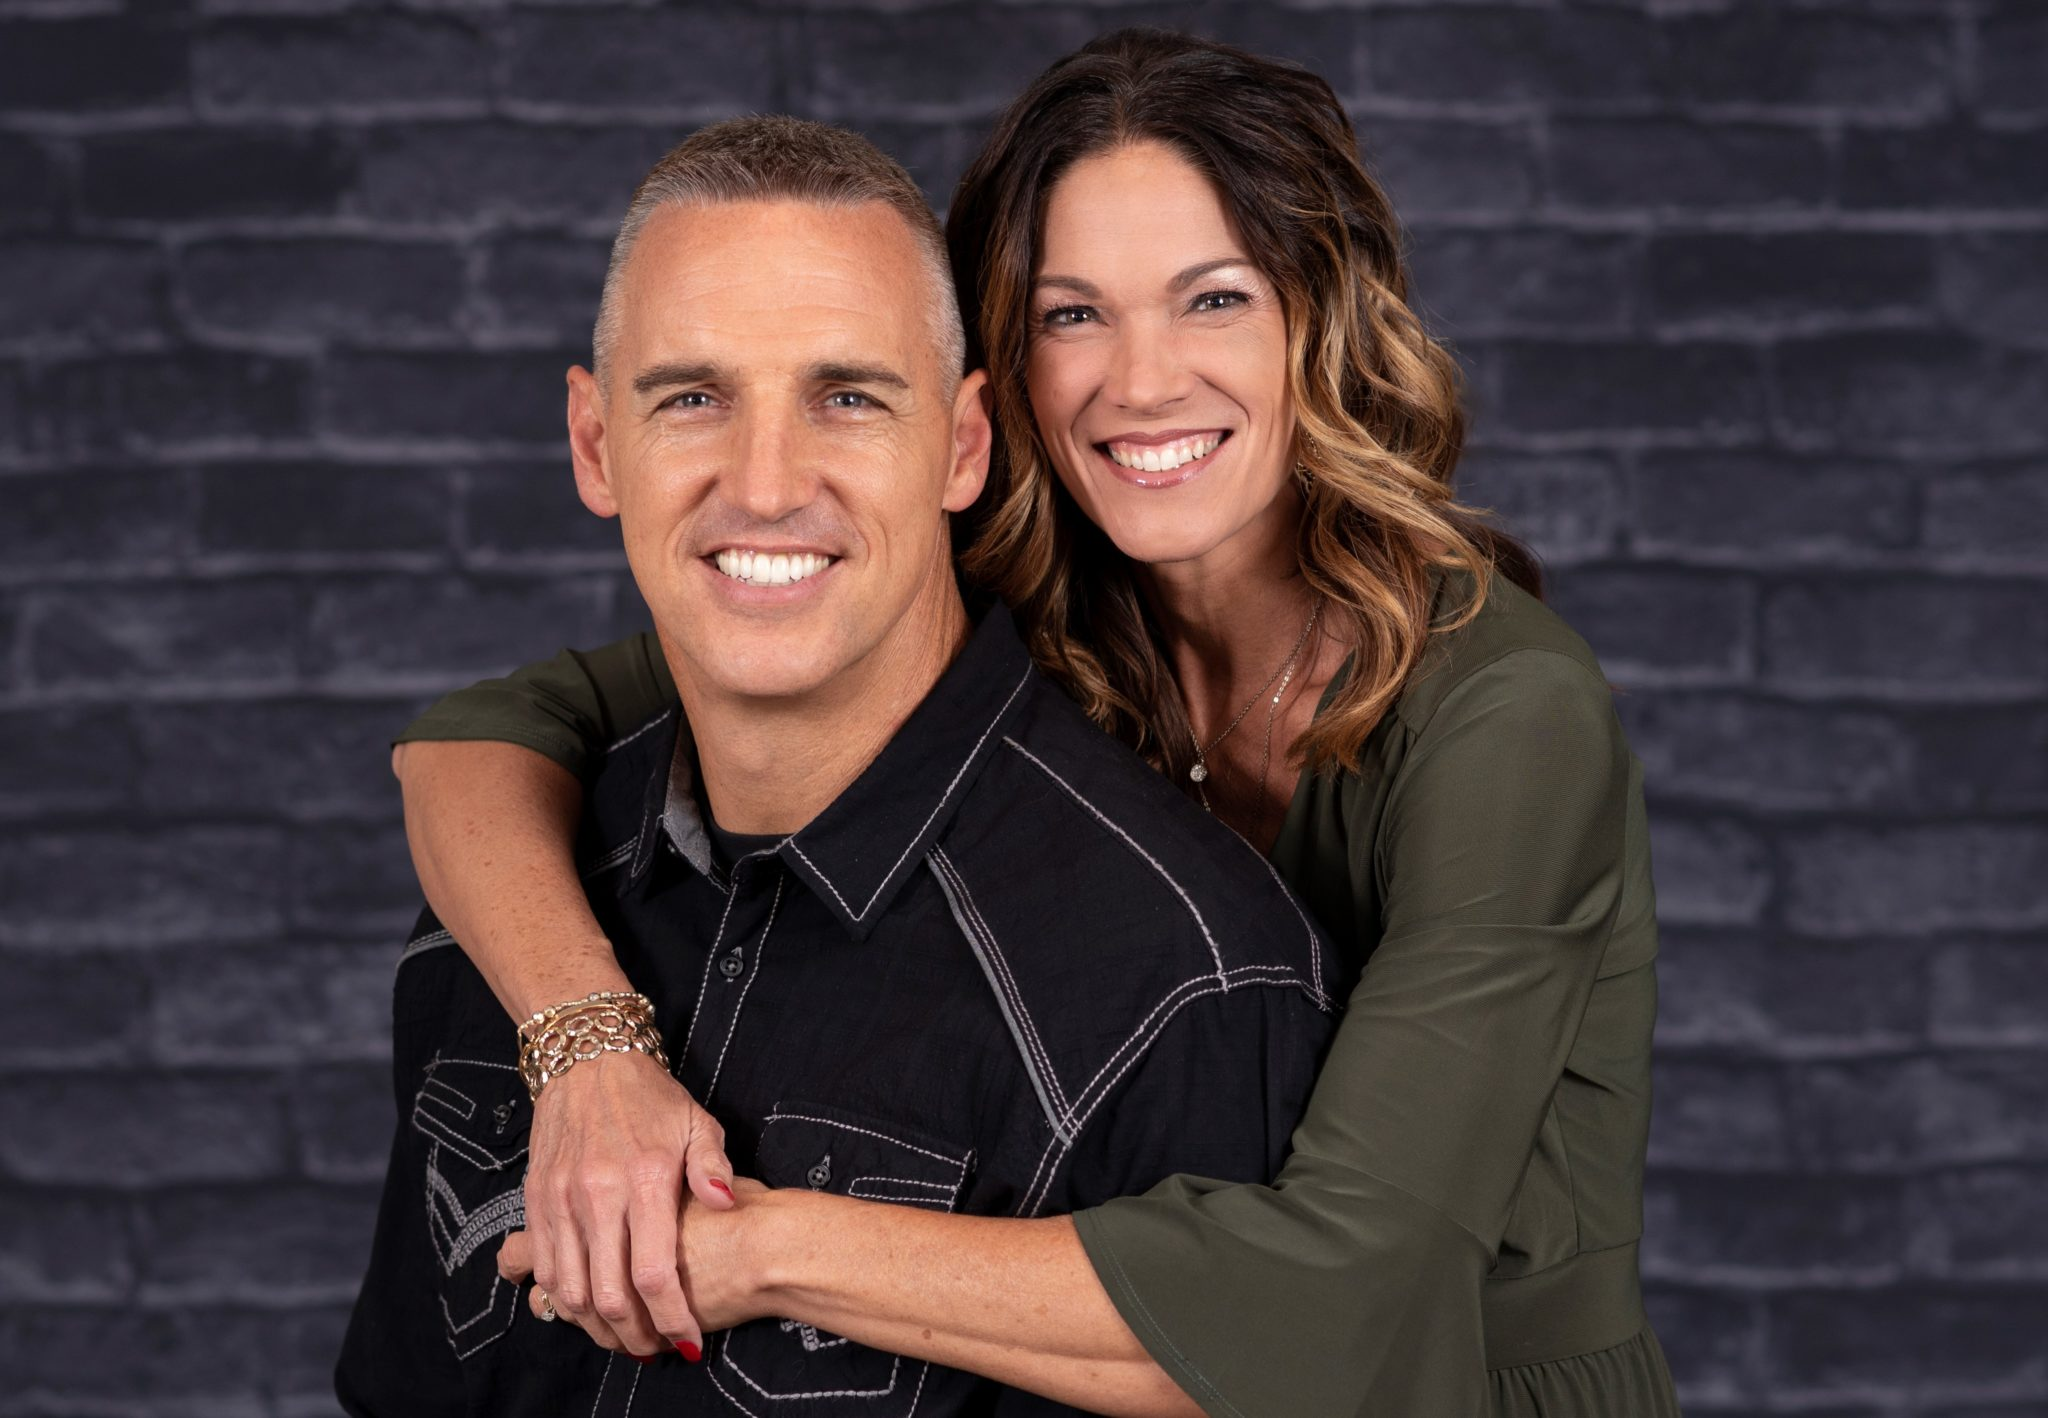 Chad and Dawn Everett